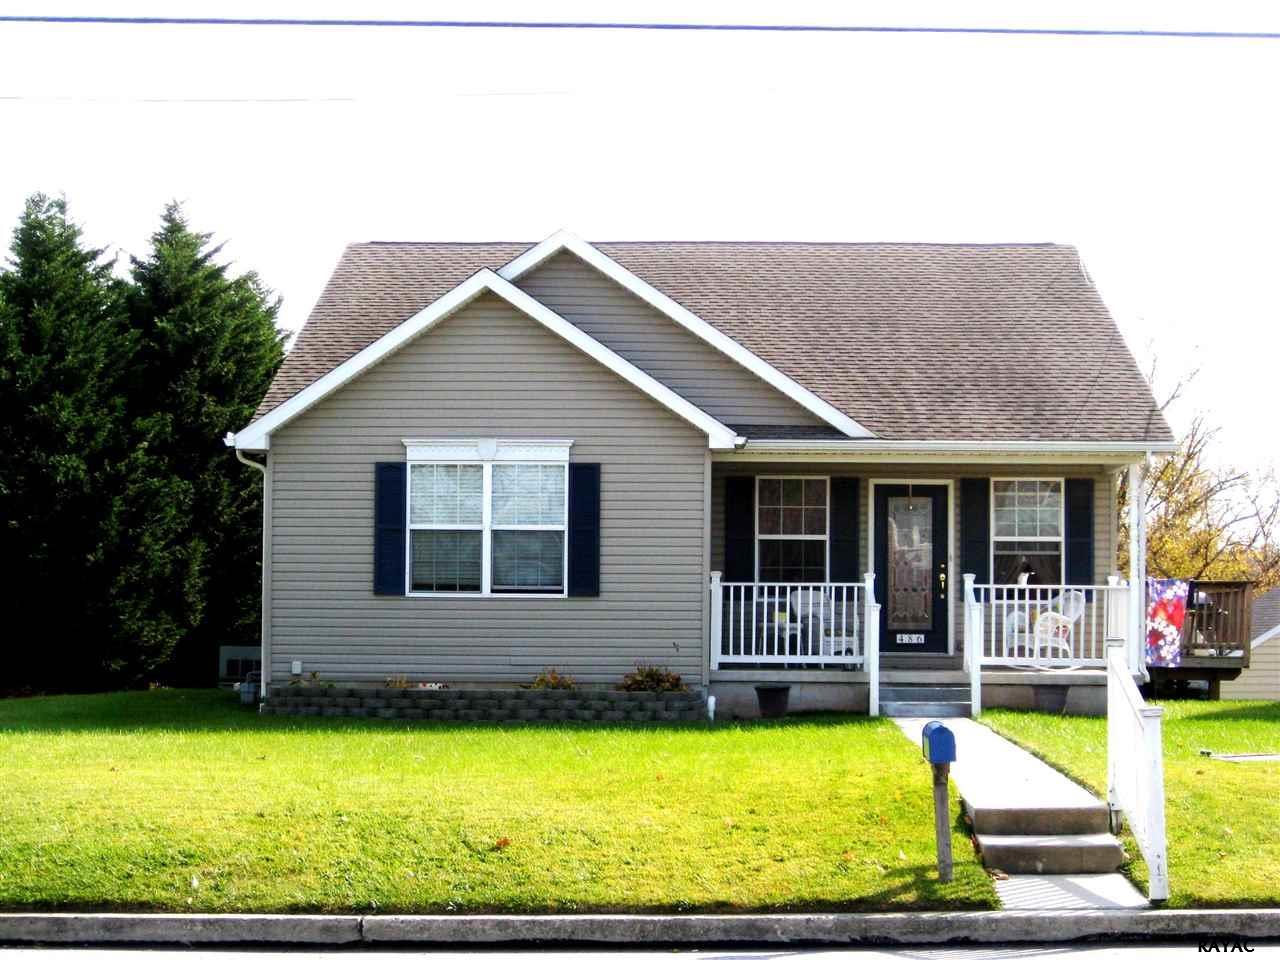 486 W King St, Abbottstown, PA 17301